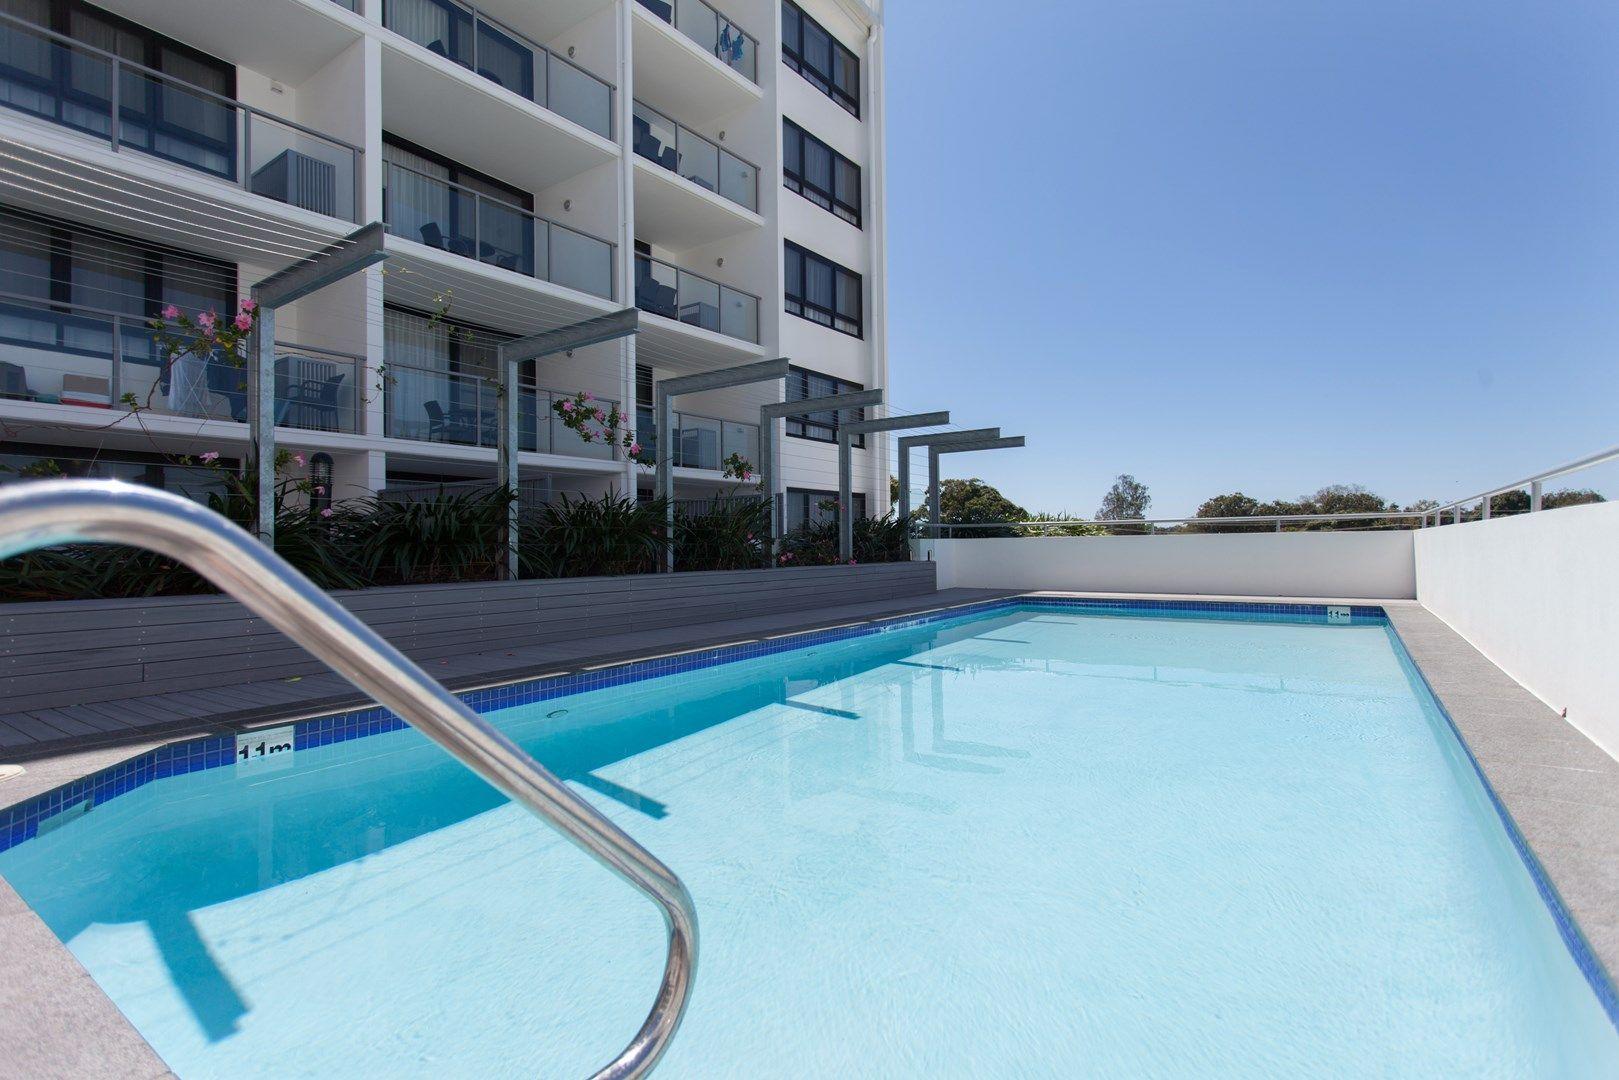 42/23 Alfred Street, Mackay QLD 4740, Image 0